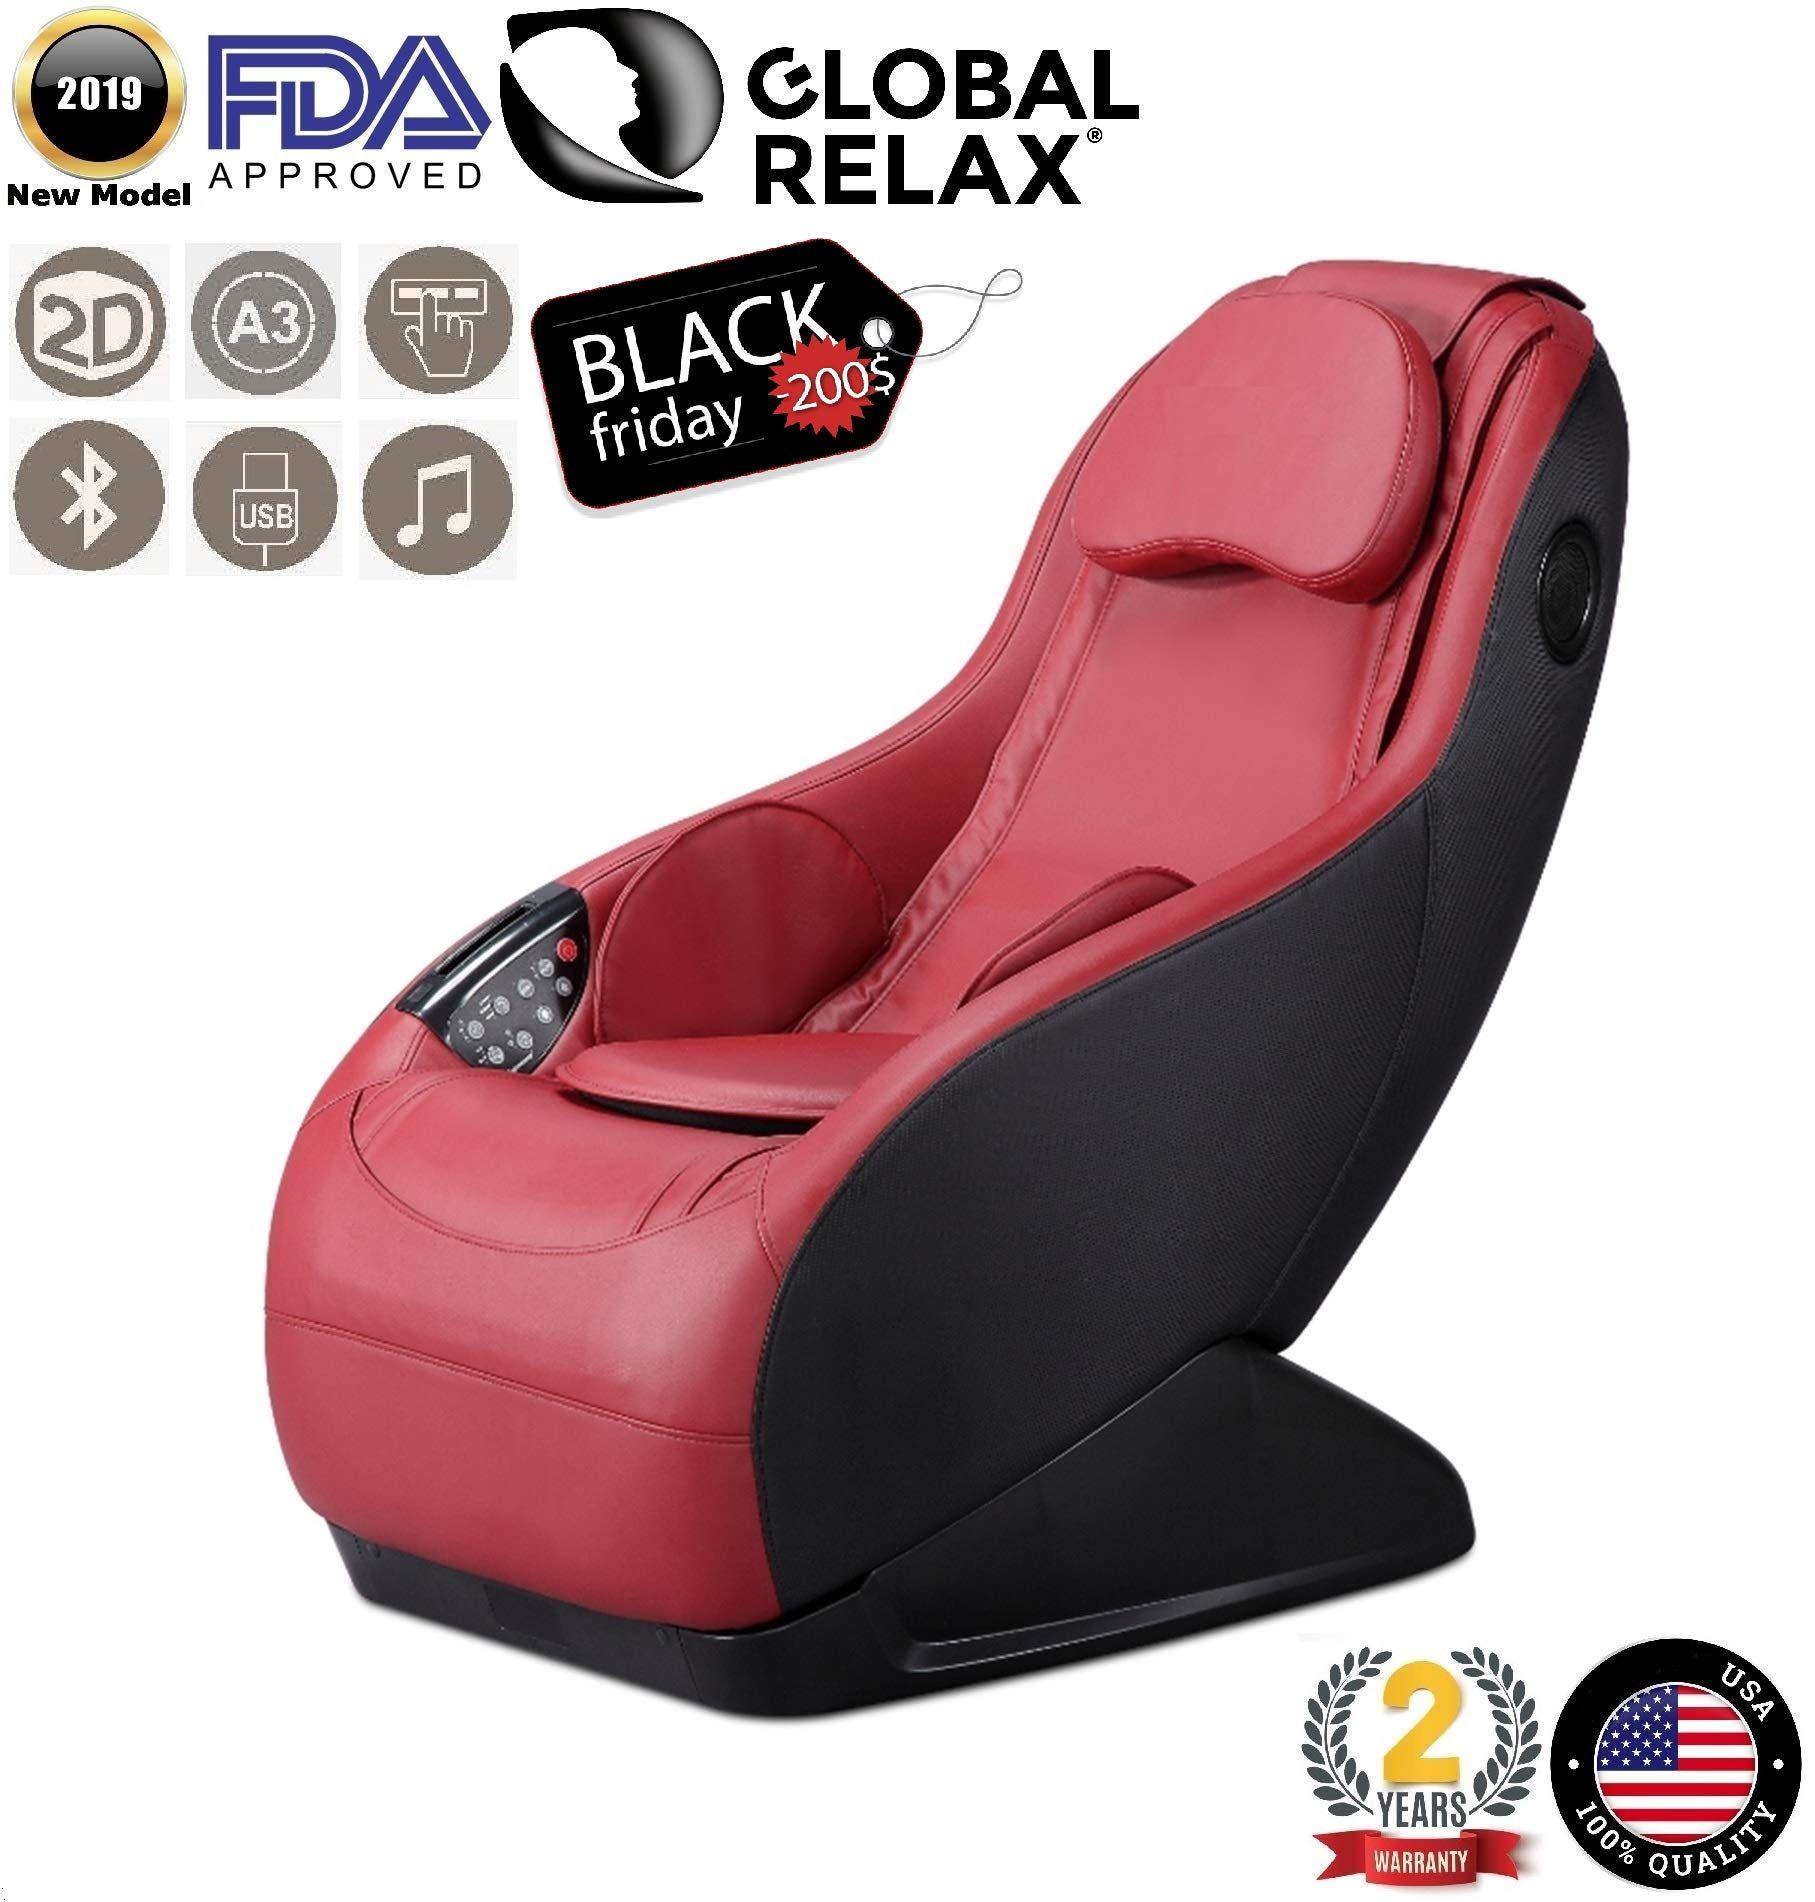 Blackfriday 200 I Guru Massage Chair Red 2019 New Model 3 Massage Modes 3d Surround Sound Relax Arm Massage Chair Shiatsu Massage Chair Feet Roller